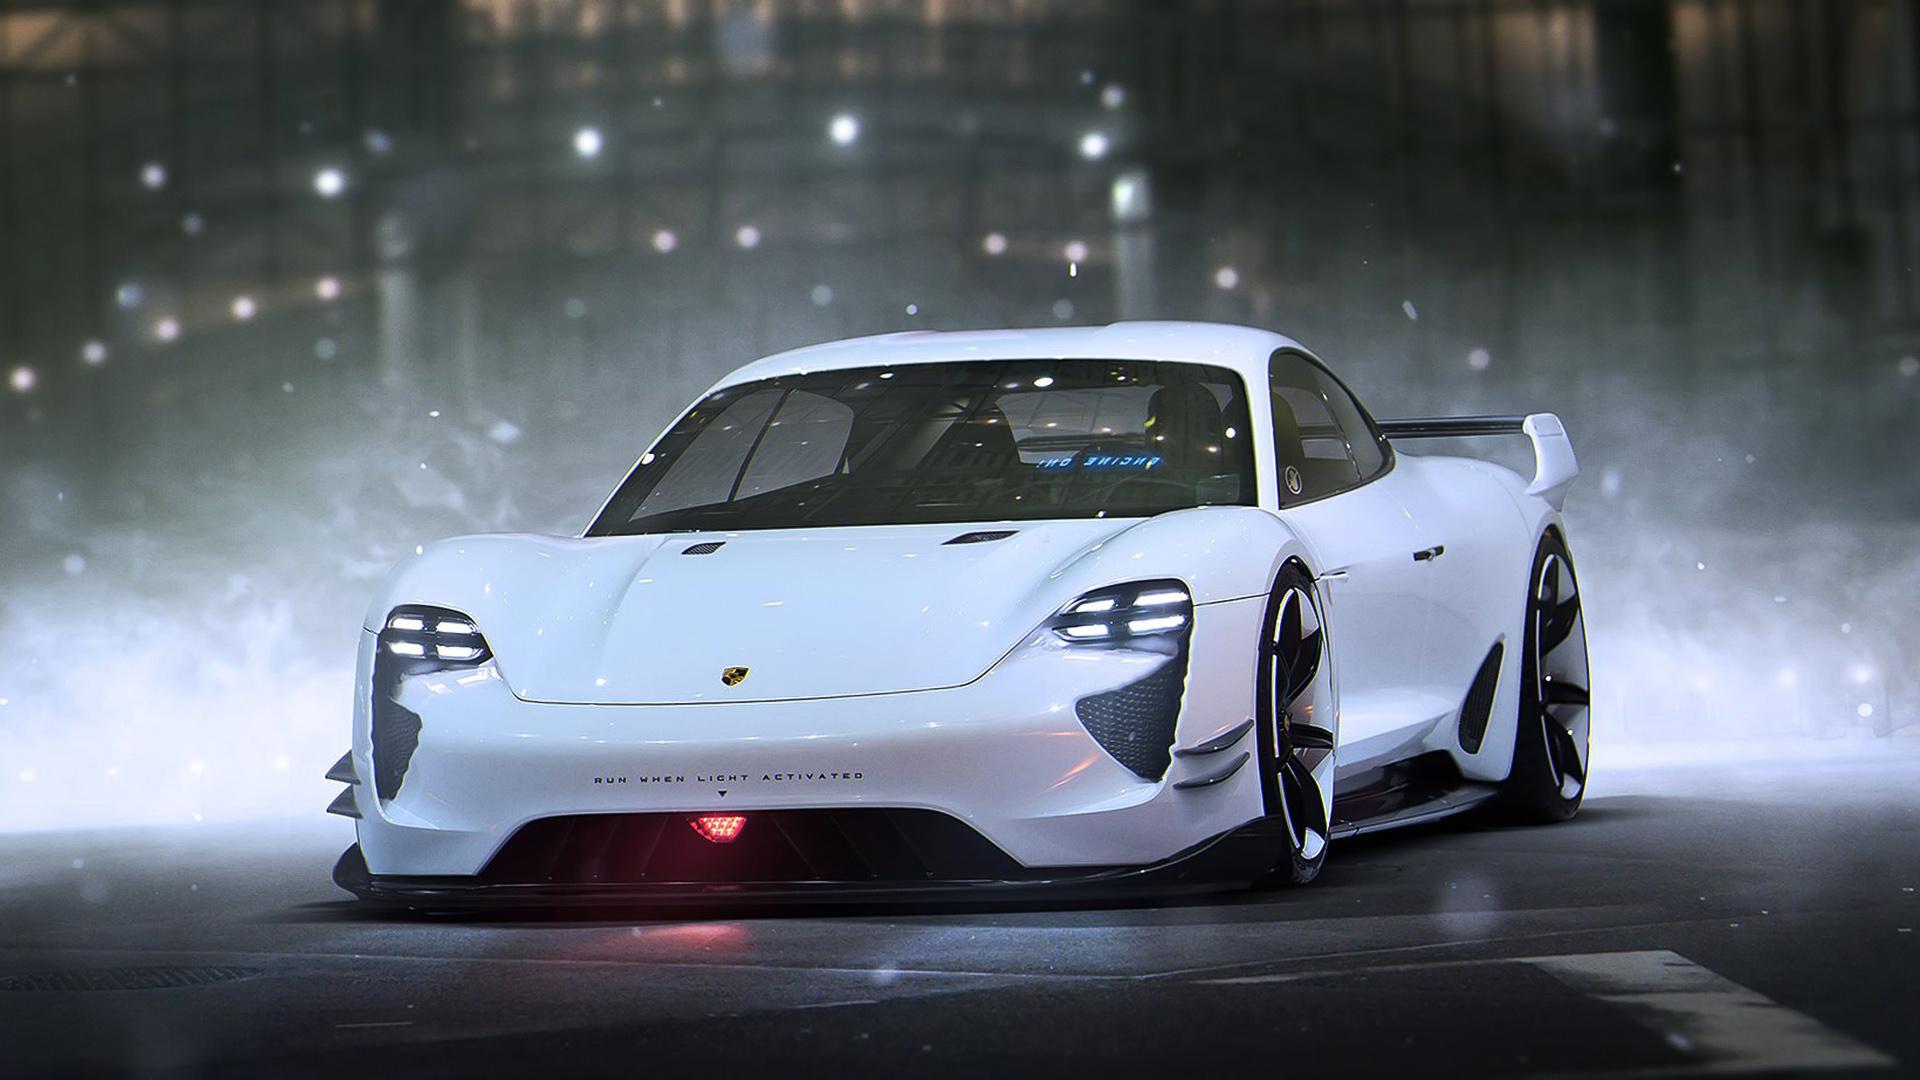 Porsche Mission E Concept Wallpaper HD Car Wallpapers